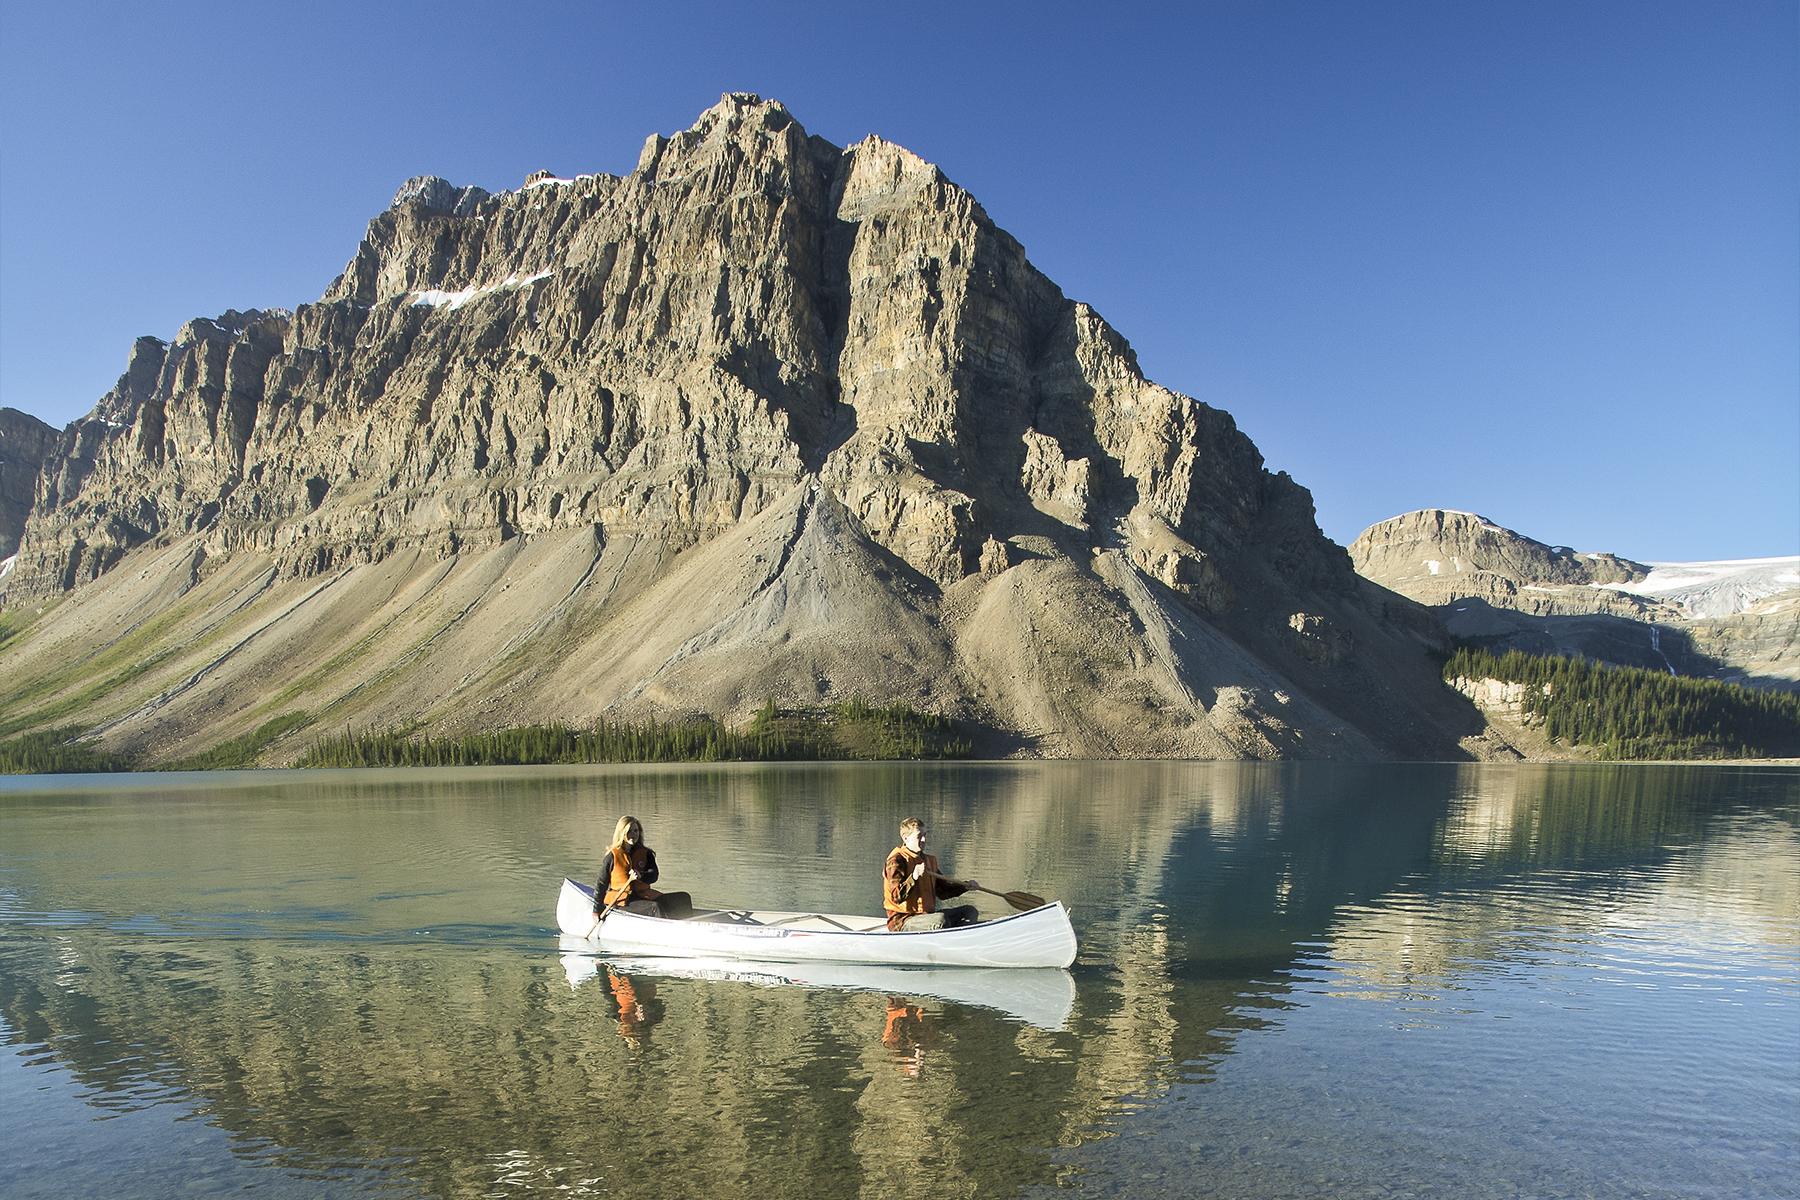 bow-lake-icefields-parkaway-kayak-alberta-canada